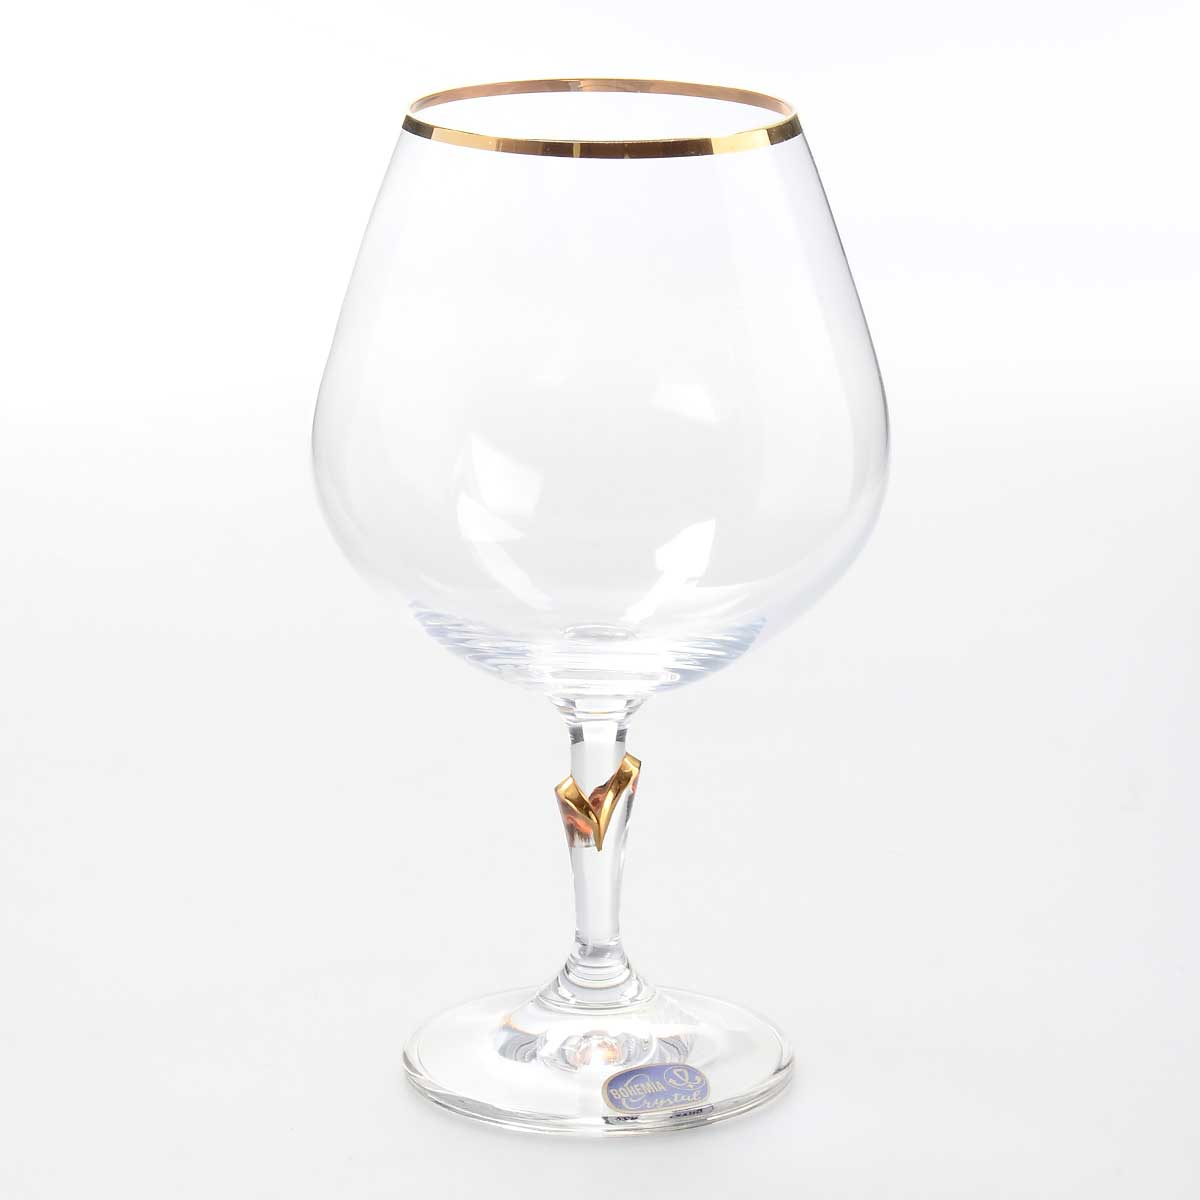 Набор бокалов для бренди Lilly Crystalex Bohemia 400 мл (6 шт)